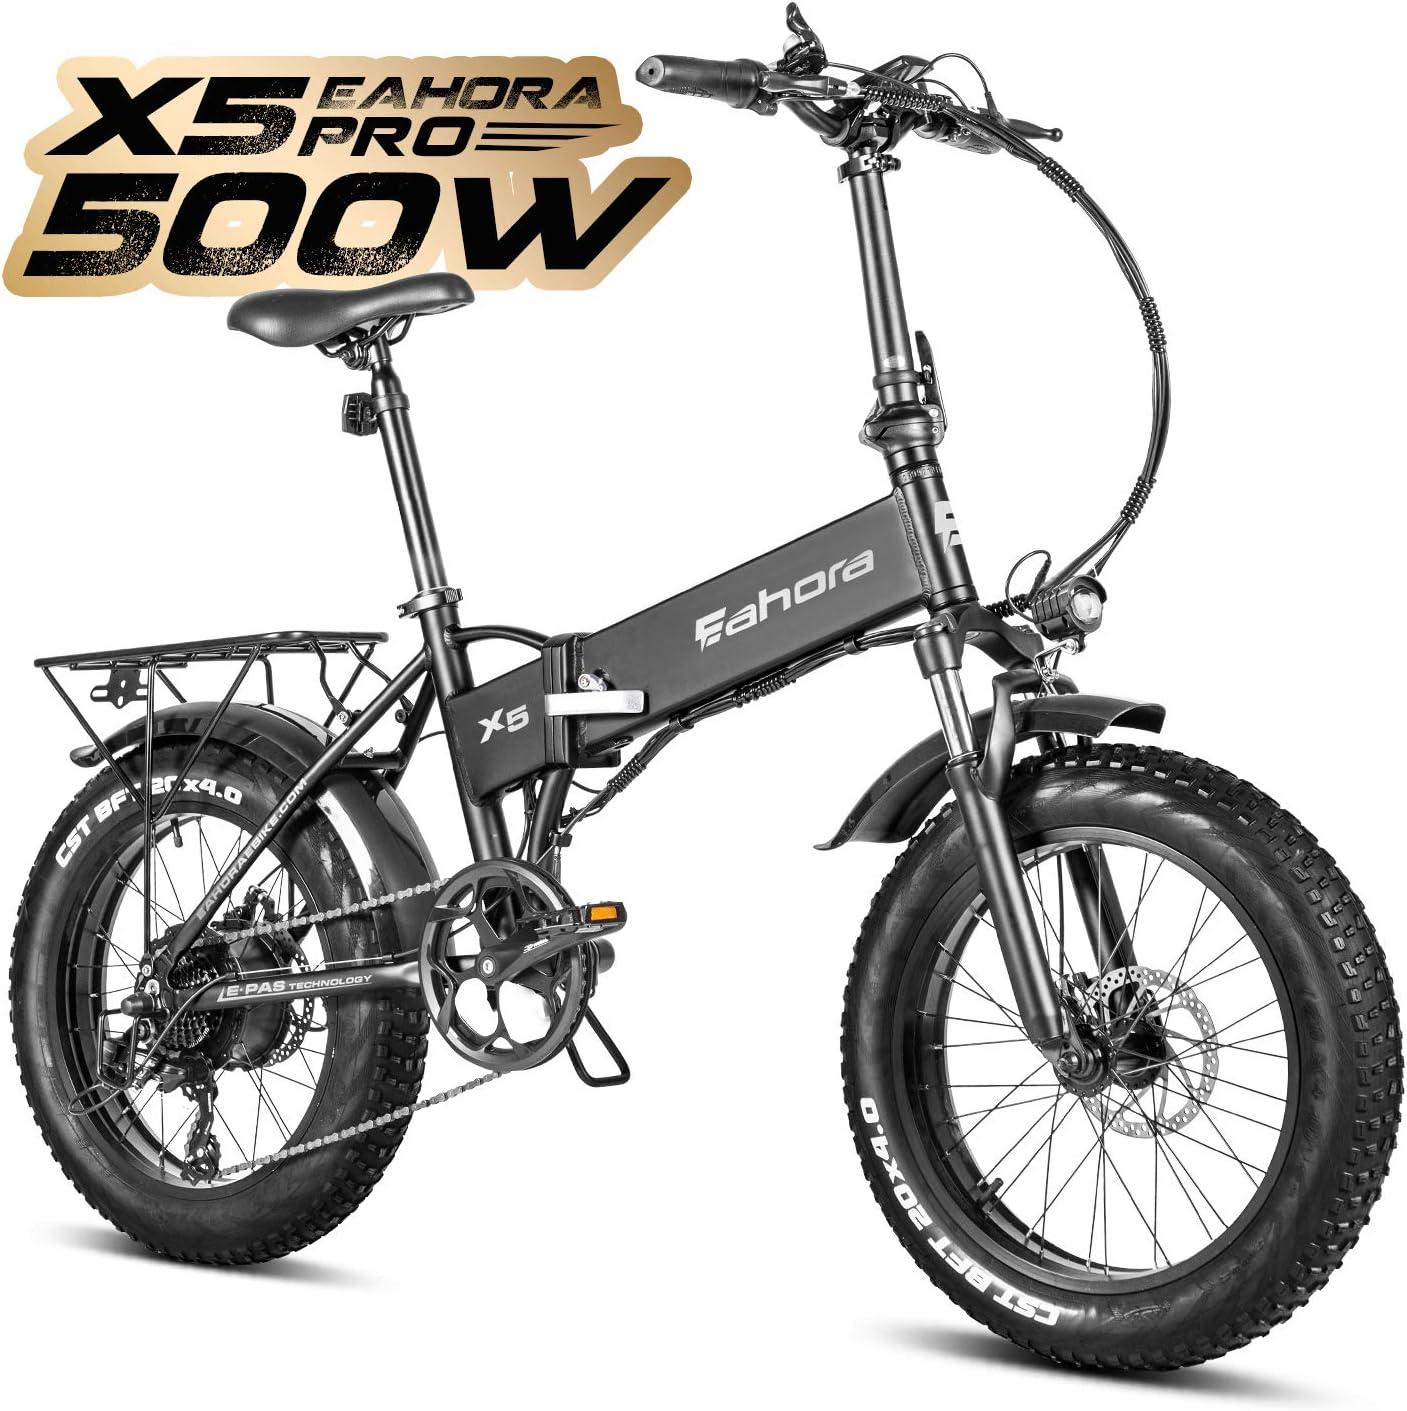 Eahora 500W 4.0 Fat Tire Electric Bike